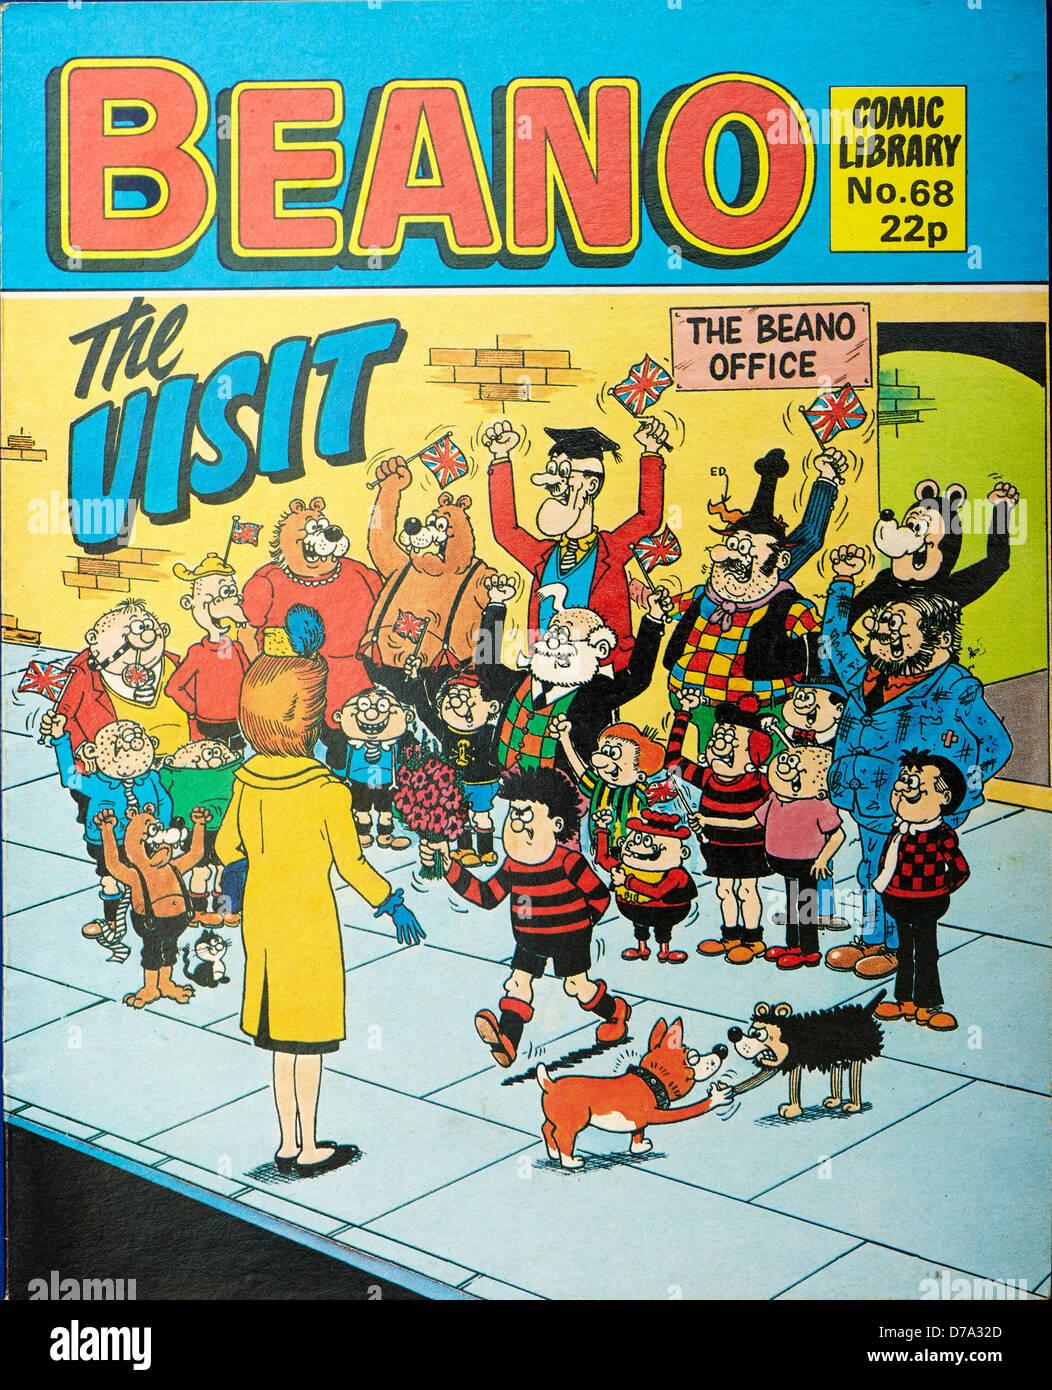 The Beano Comic magazine (Comic Library) - Stock Image